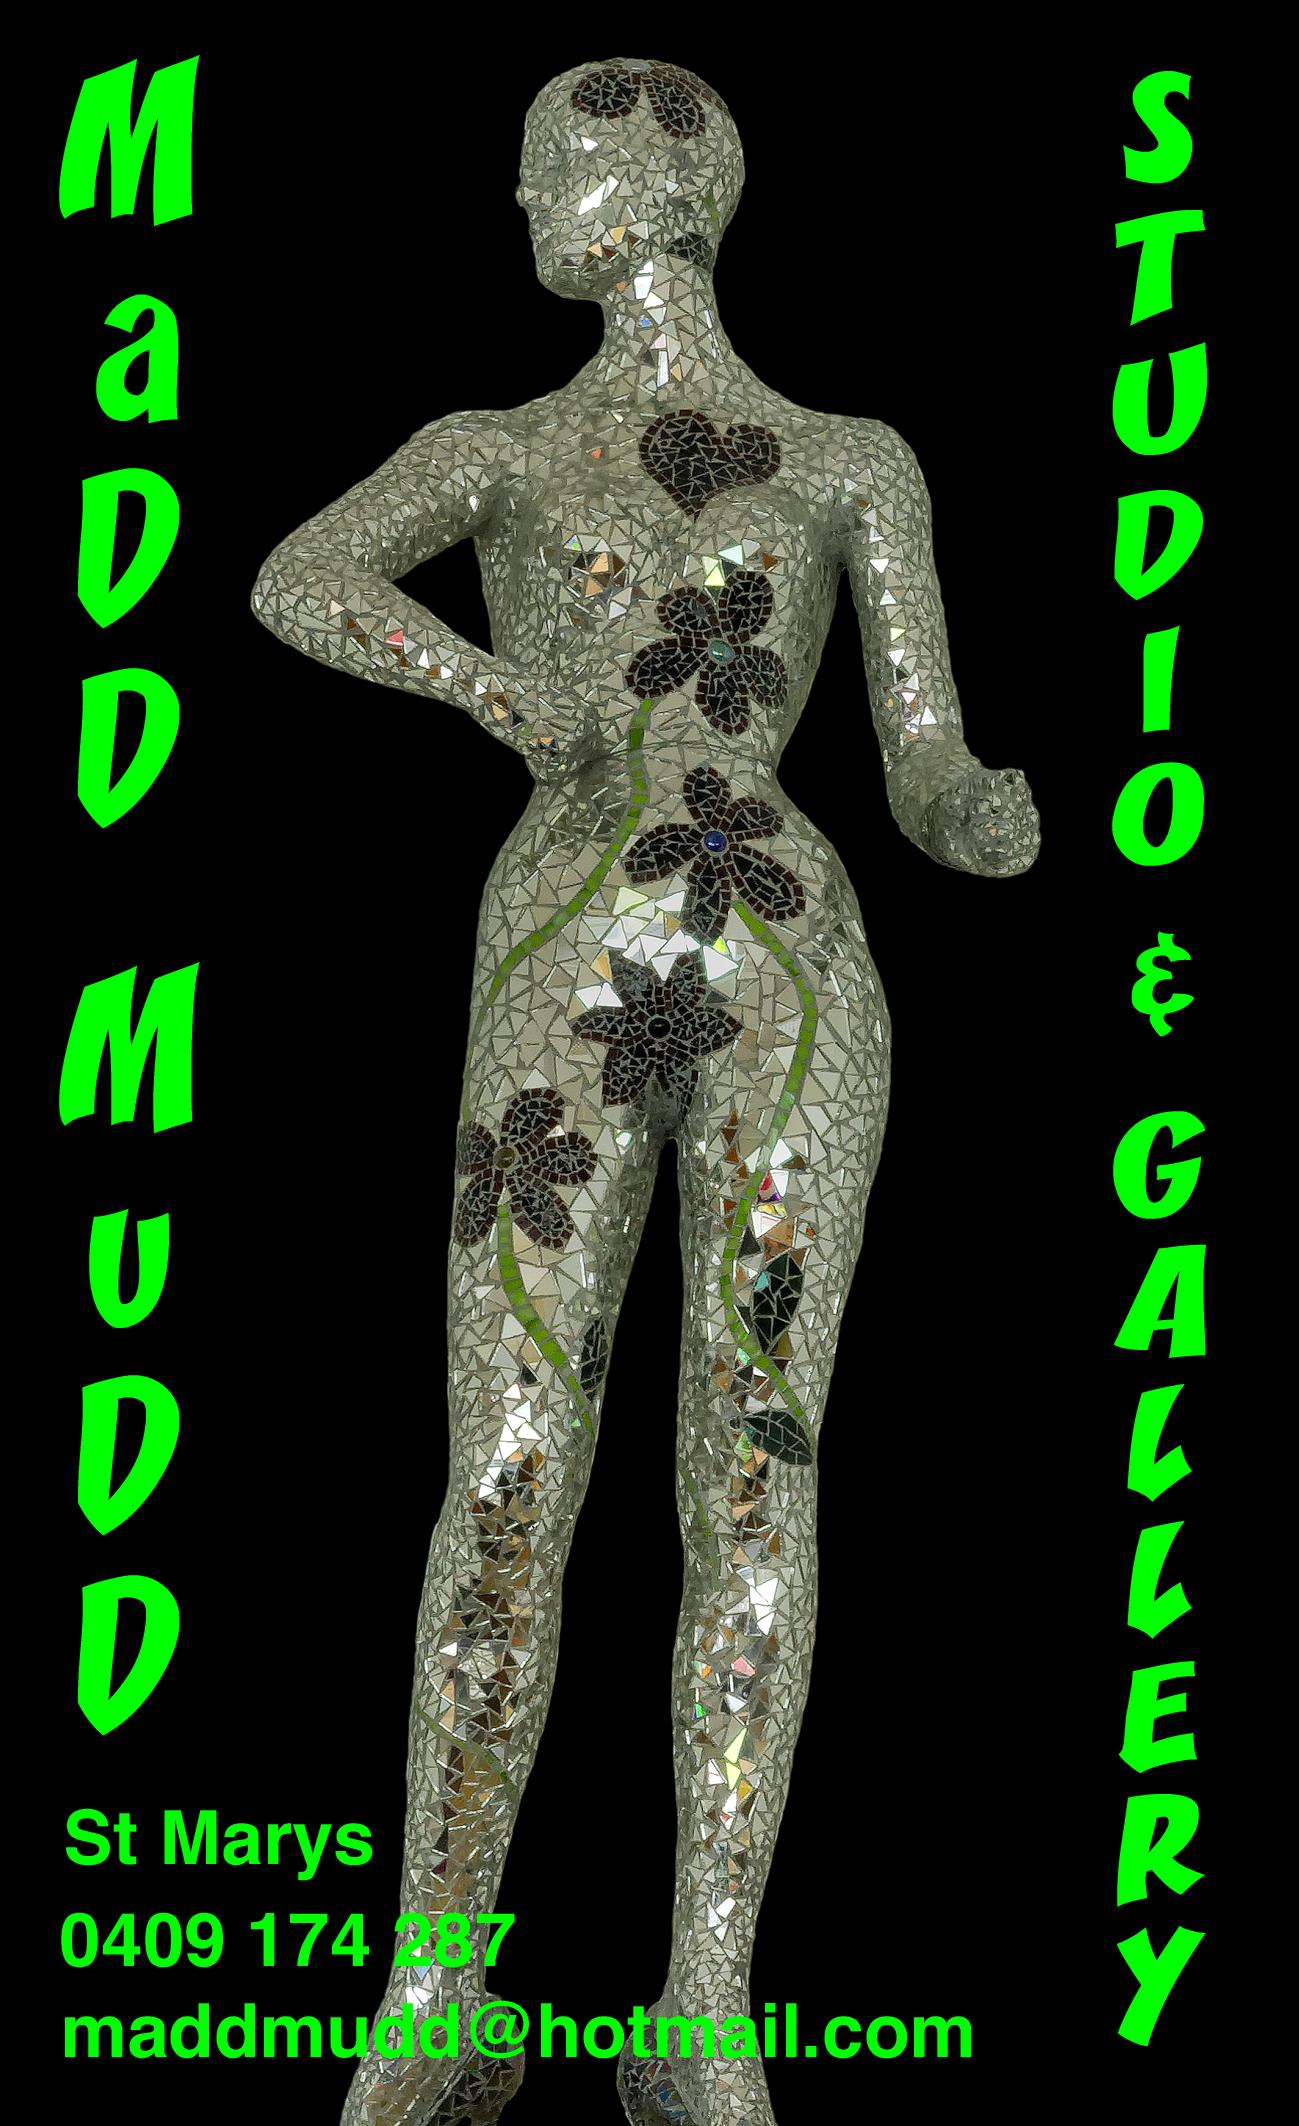 GET ad Madd Mudd